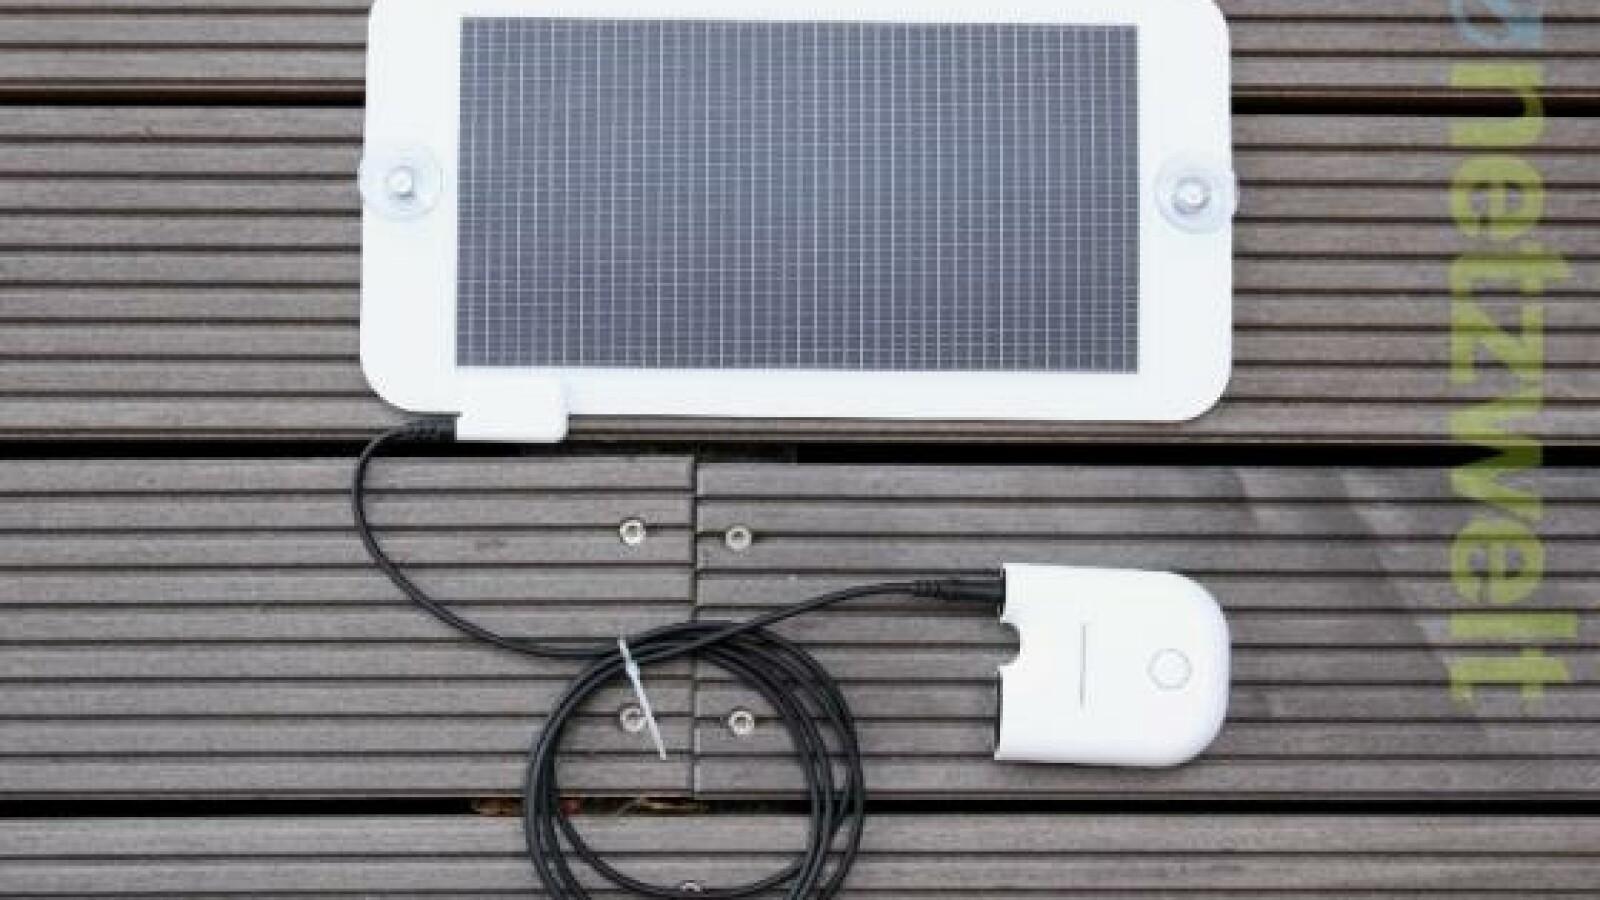 changers im test solar ladeger t mit social media anschluss netzwelt. Black Bedroom Furniture Sets. Home Design Ideas